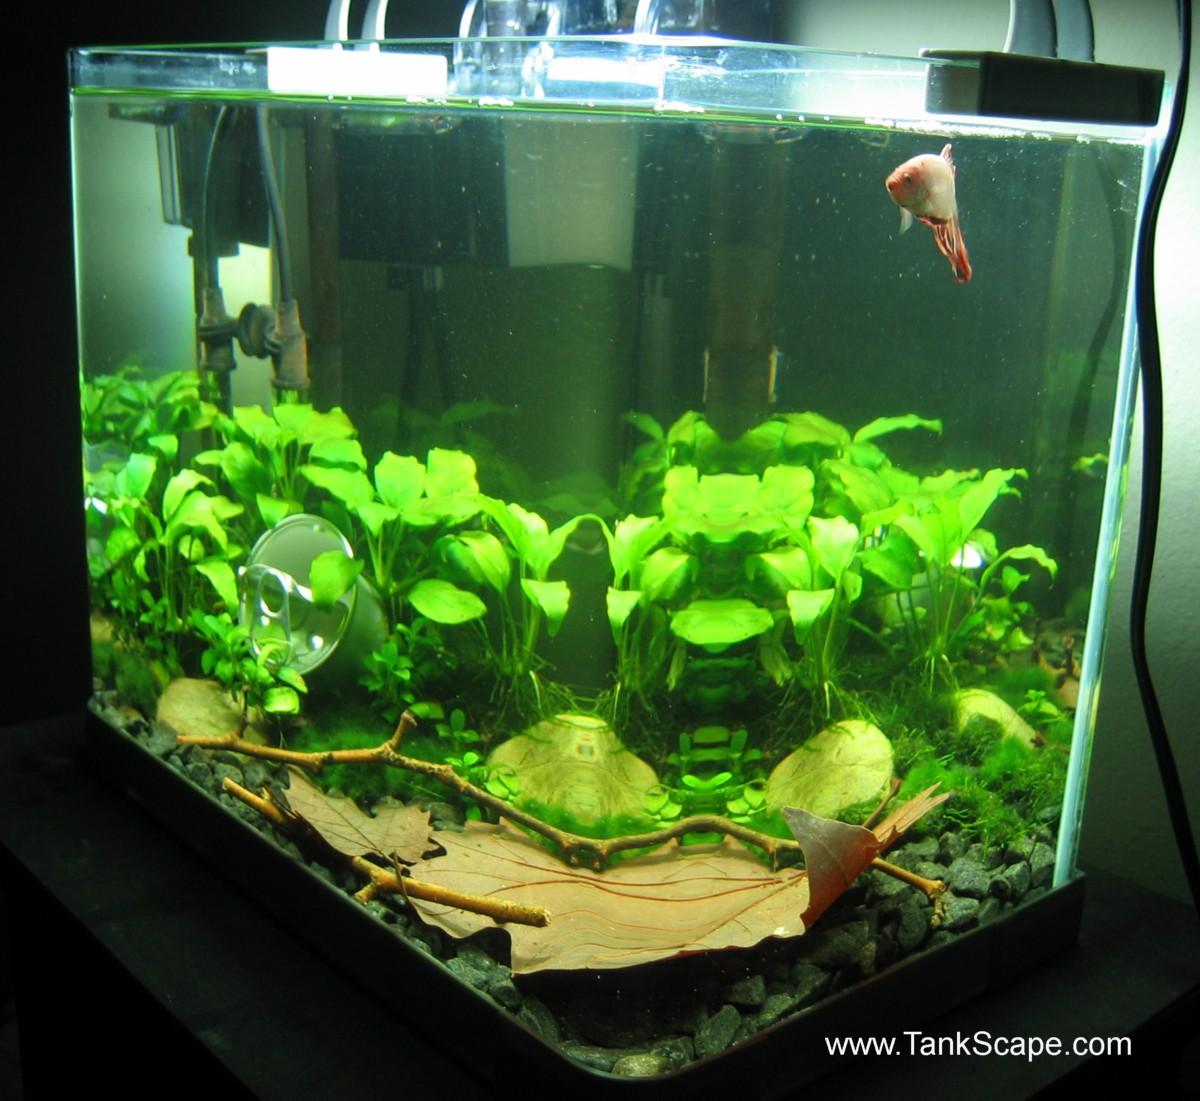 Tank scape my betta tank the river bed for Betta fish plant tank